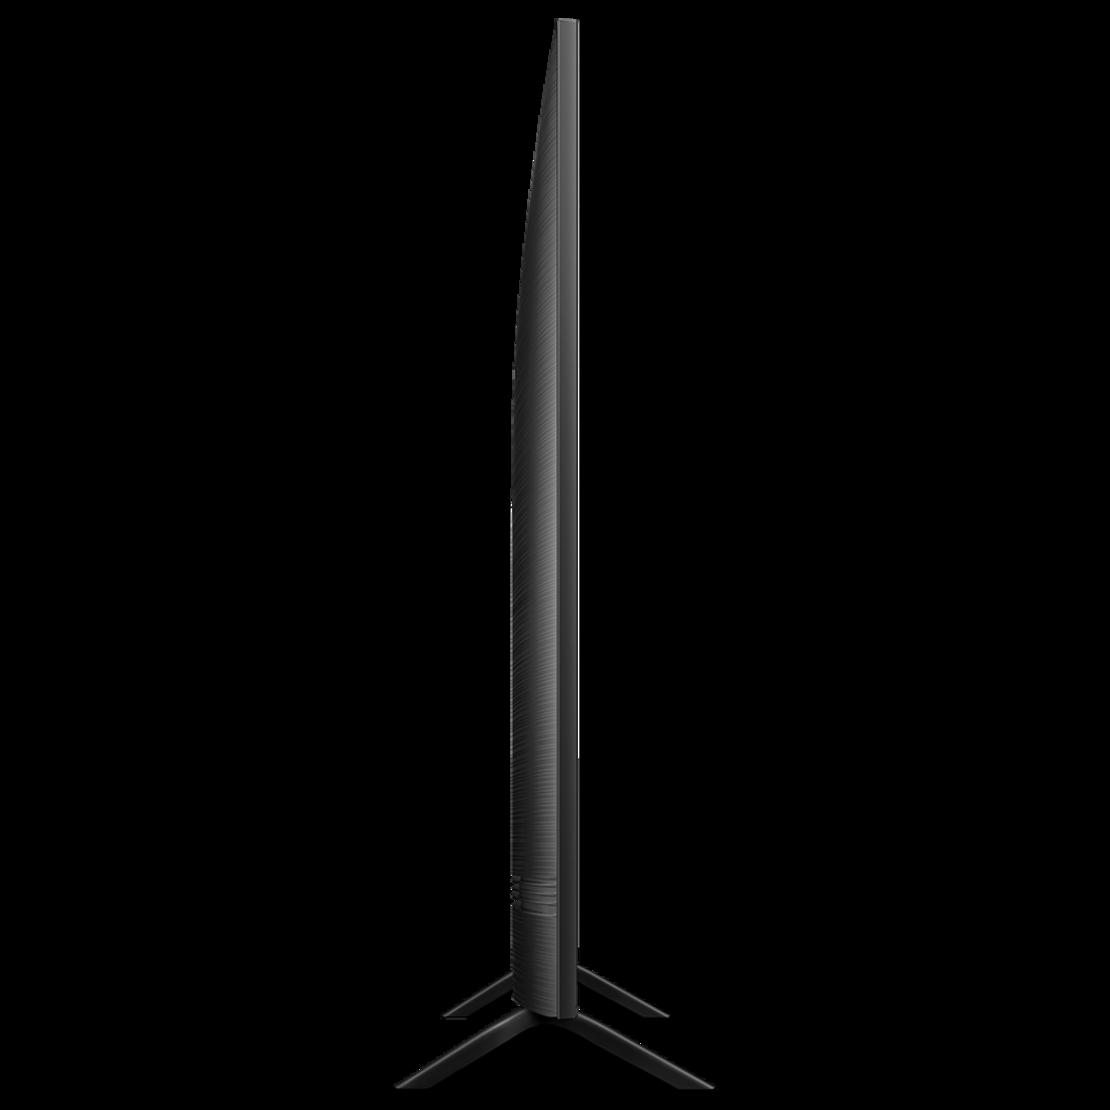 טלוויזיה Samsung 65 4K דגם QE65Q60T